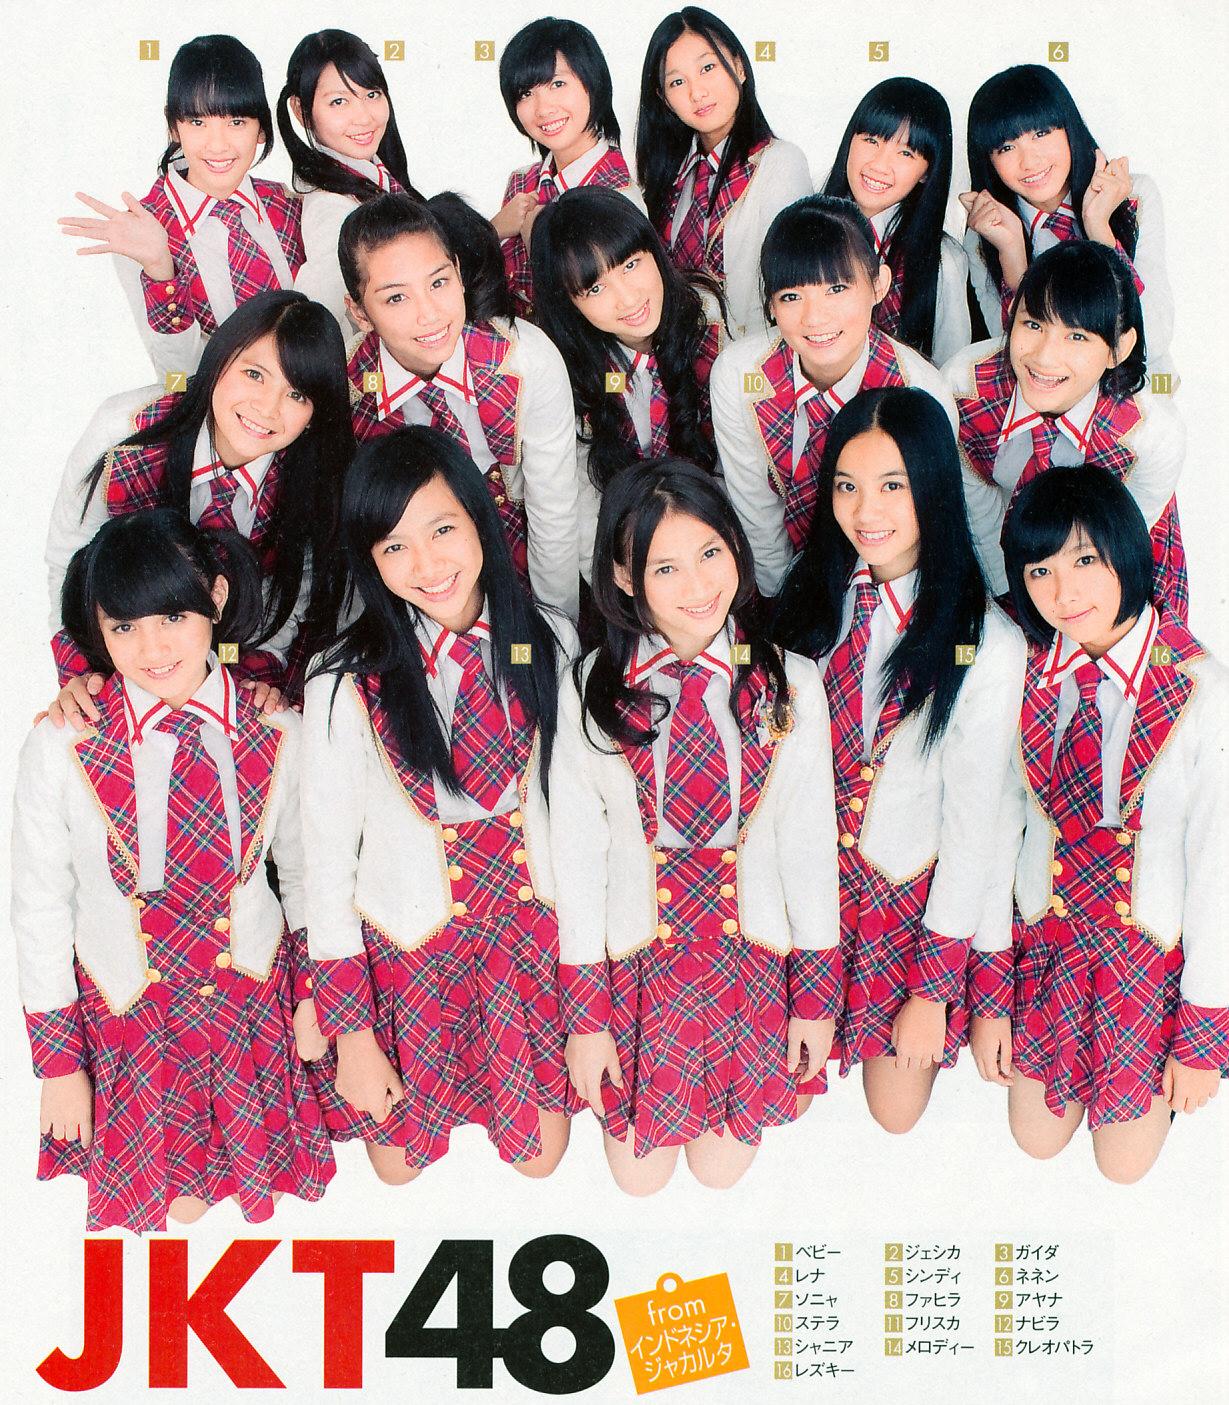 judul jkt48 full album tag jkt48 full album download jkt48 full album